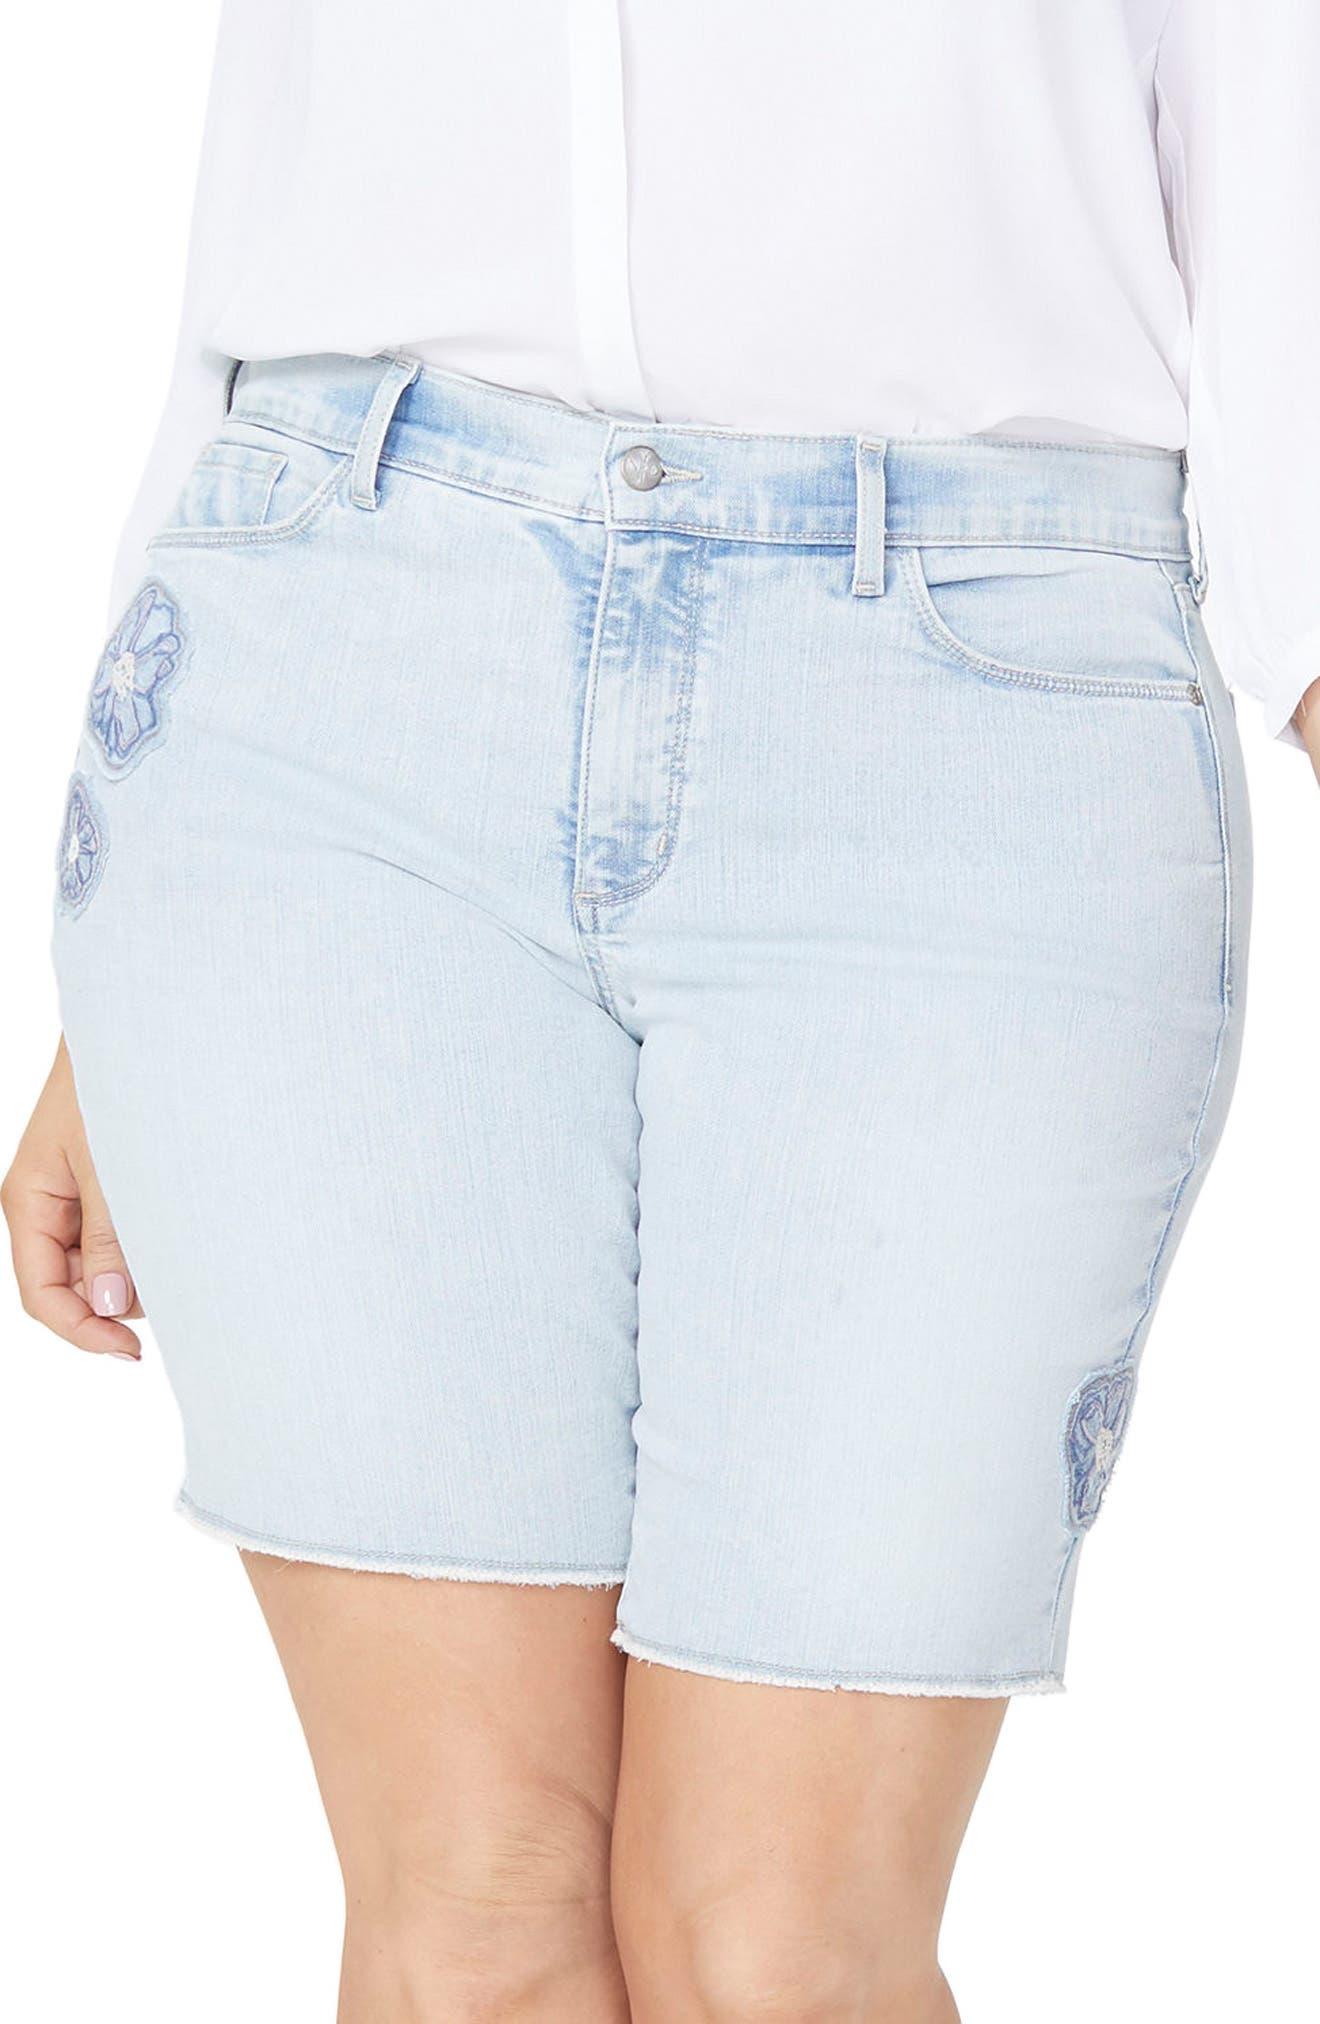 Briella Dream Blossom Denim Bermuda Shorts,                             Main thumbnail 1, color,                             422